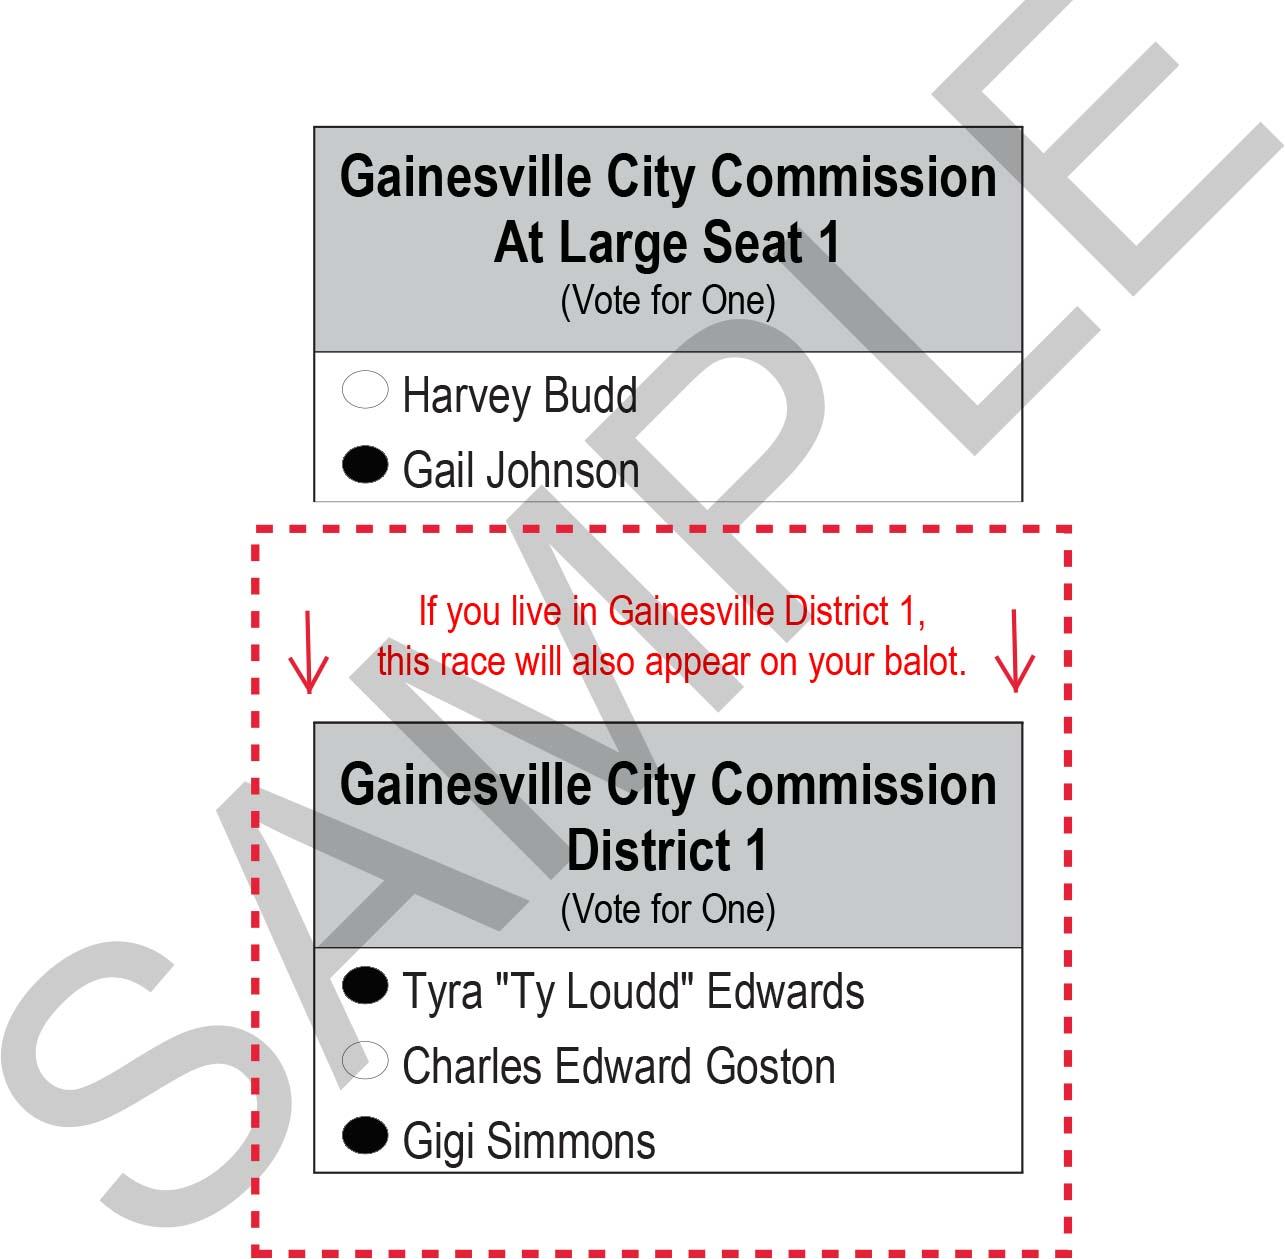 2018 Gainesville Sample Ballot